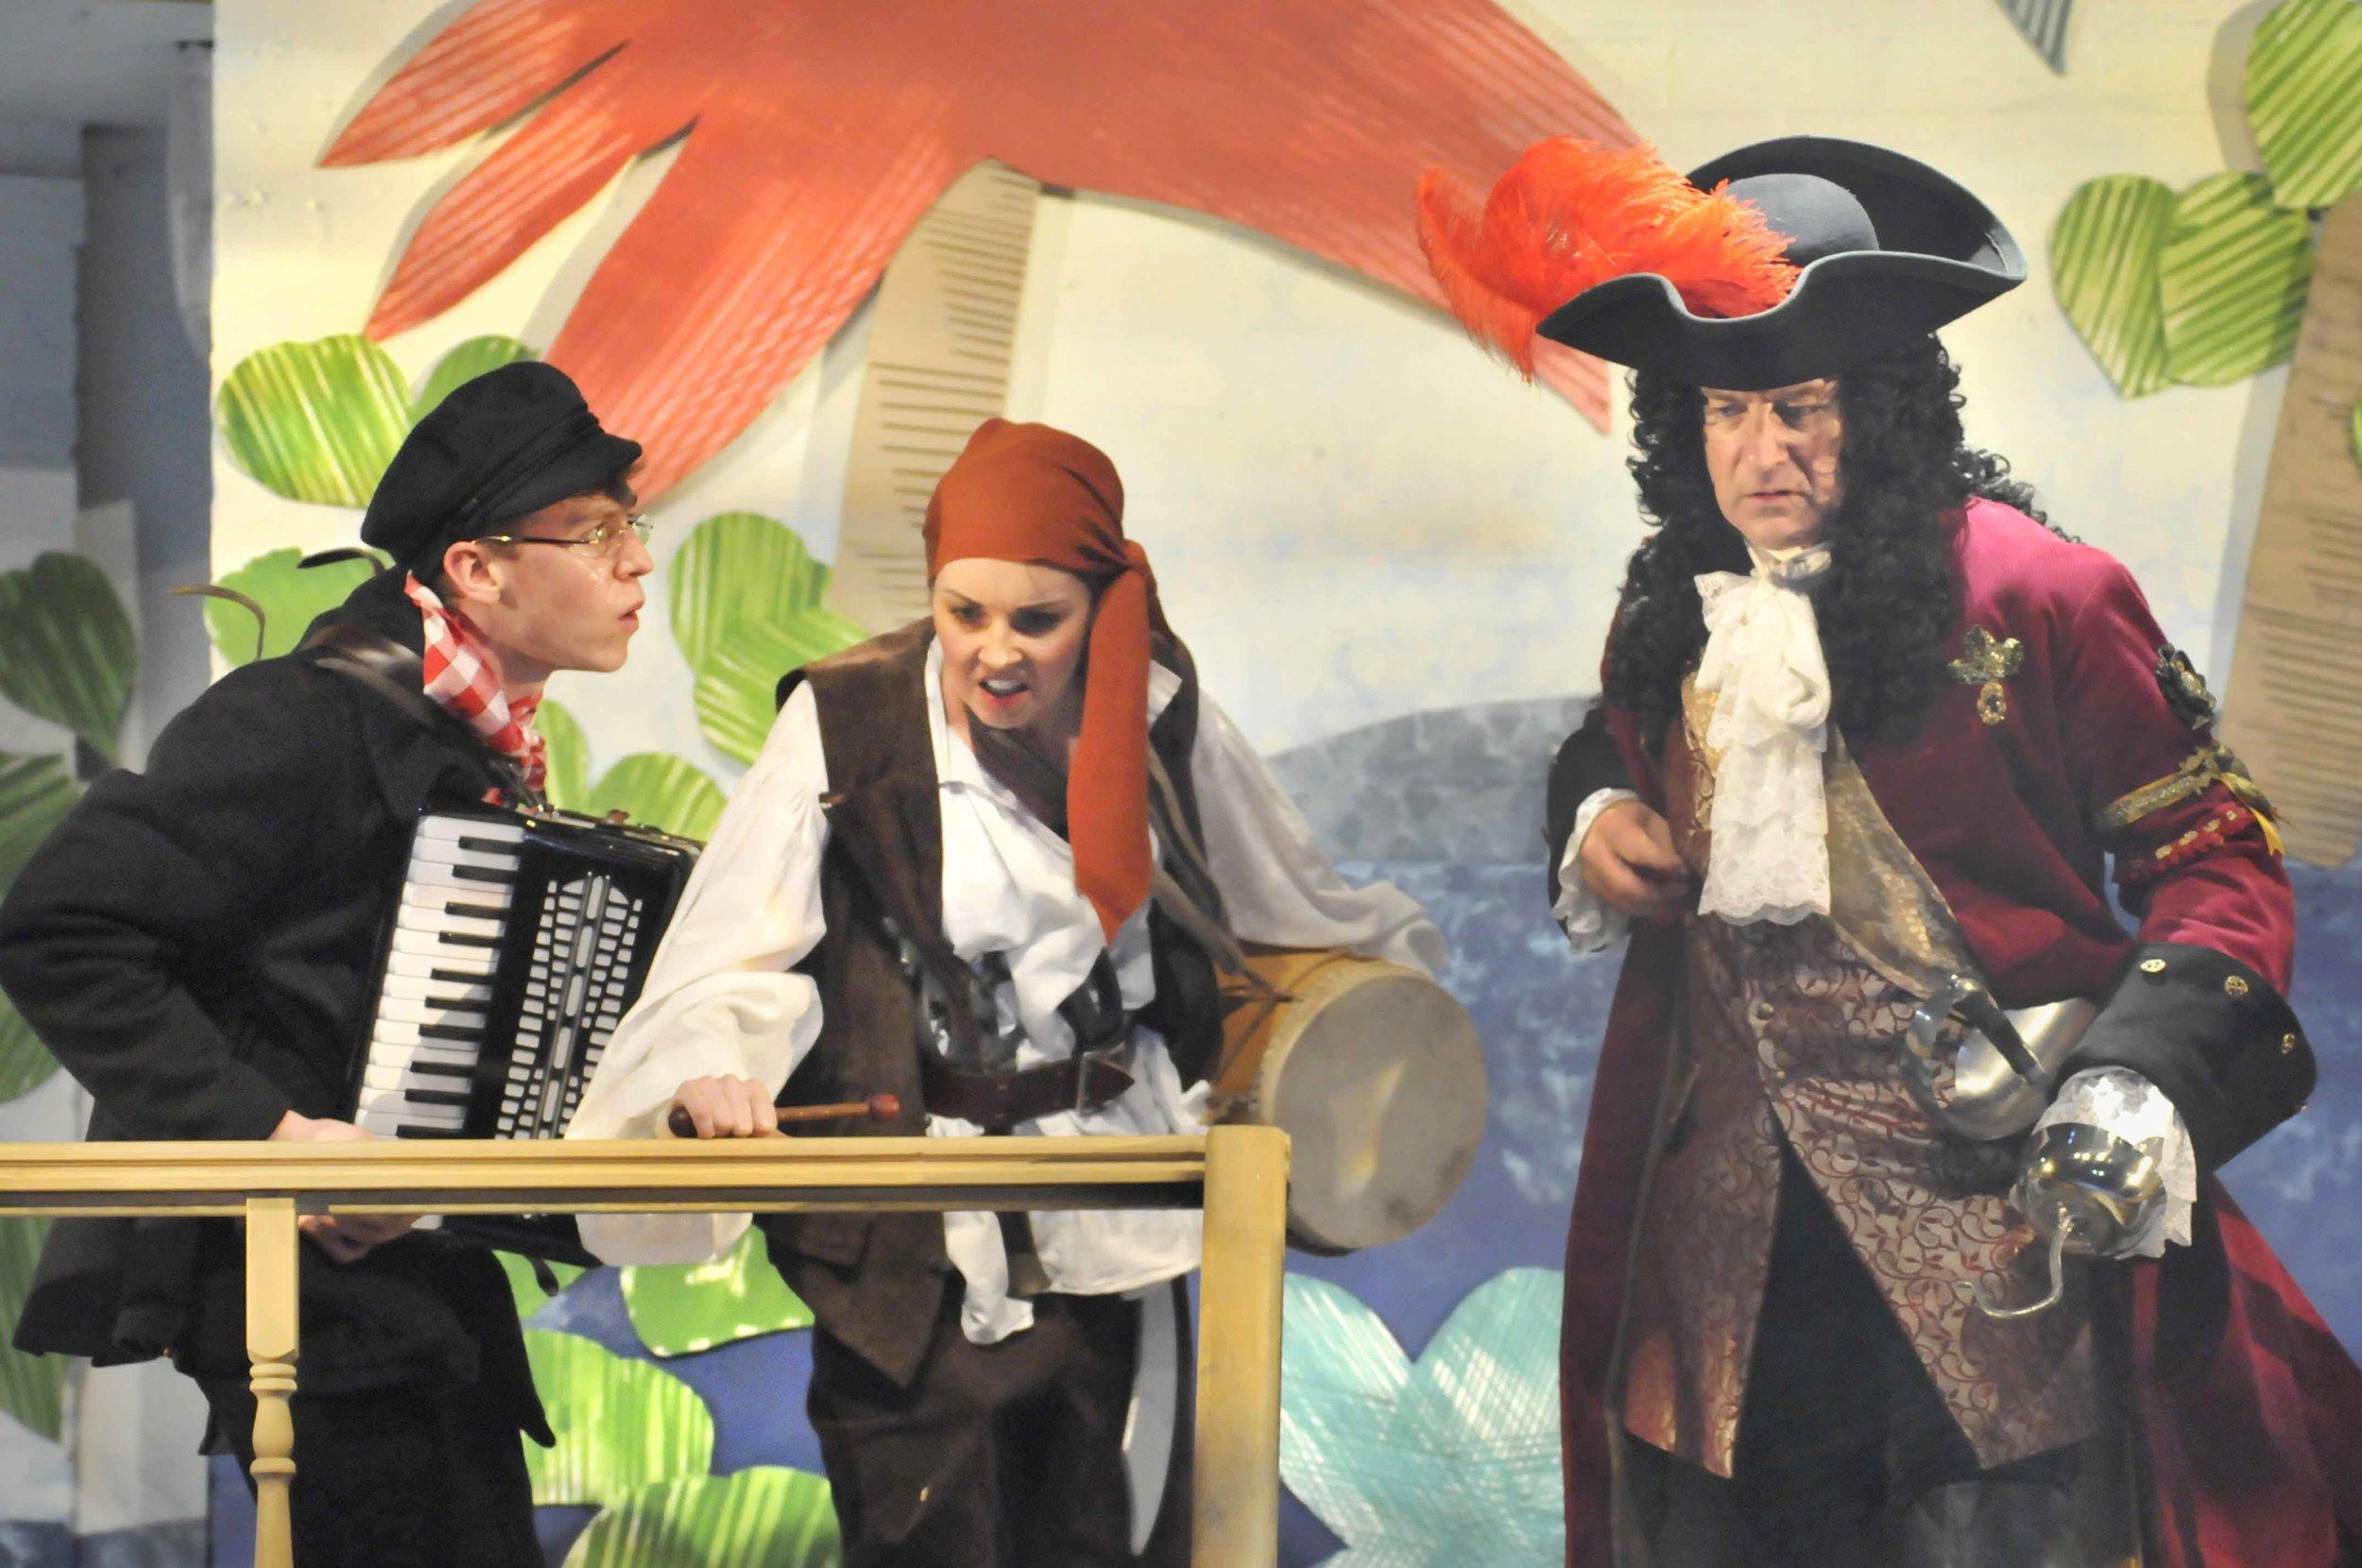 Peter Pan - pirates in Neverland.jpg